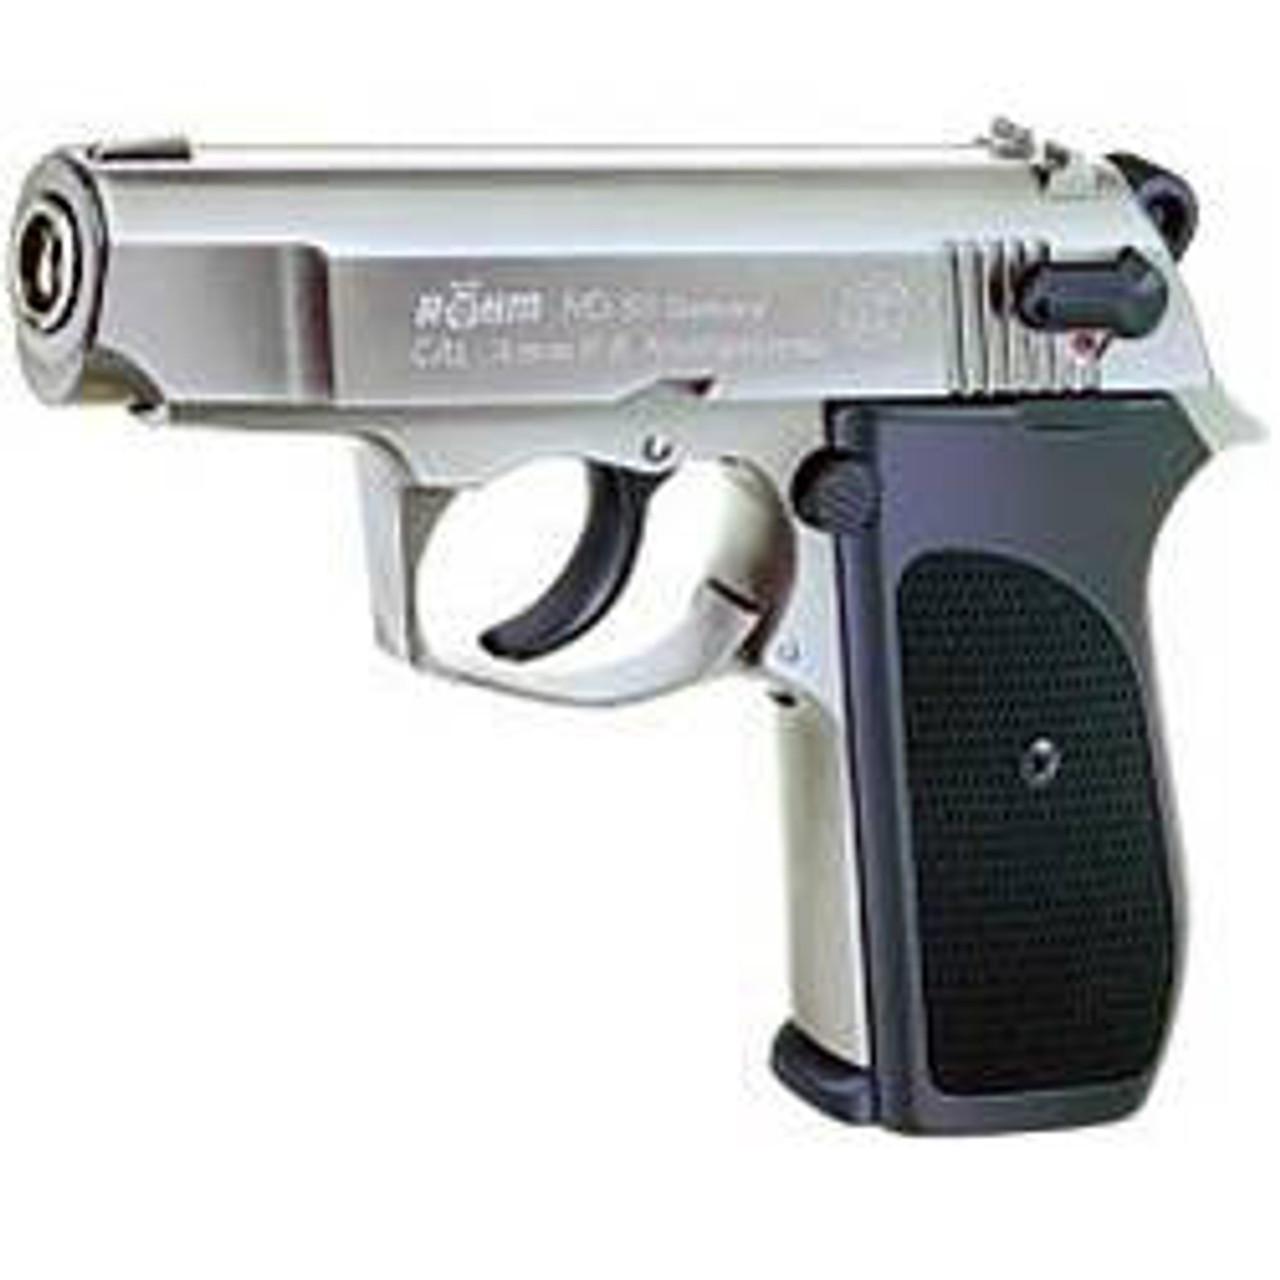 Rohm RG-88 9mm P A K  Blank Pistol -Chrome